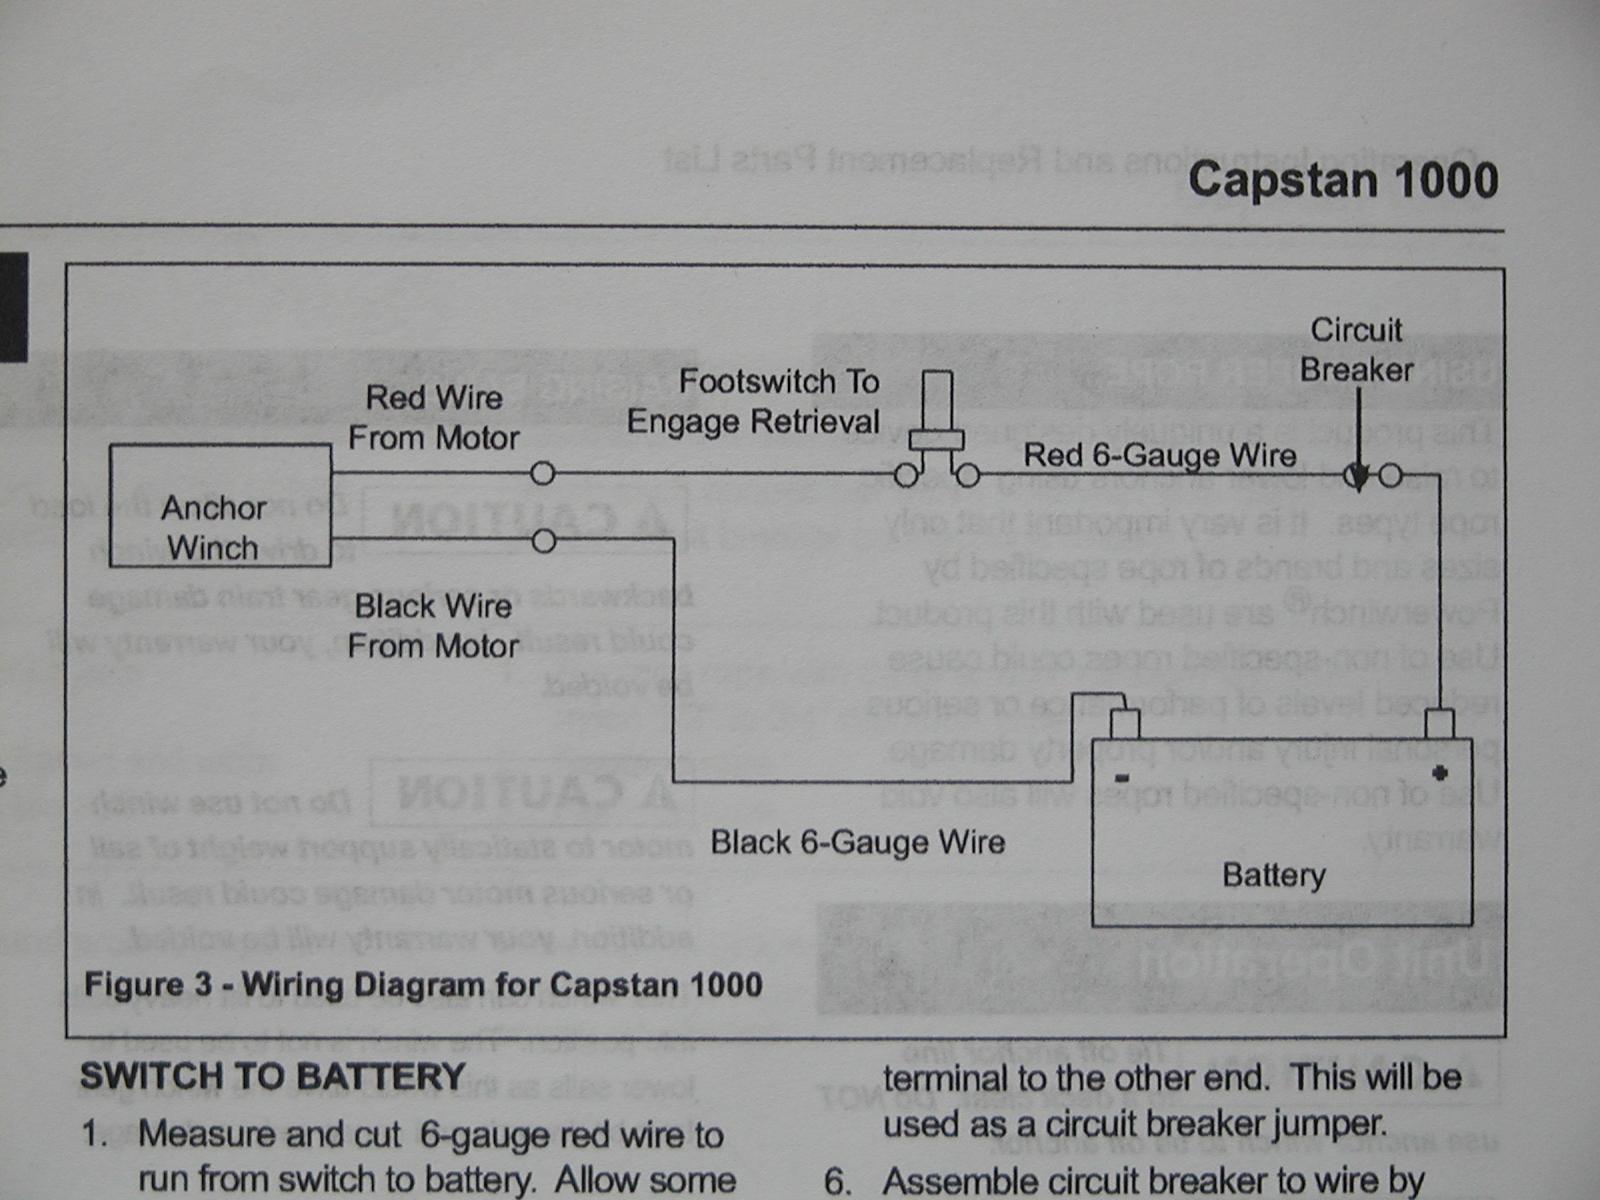 Viper Anchor Winch Wiring Diagram F150 Starter New Era Of Voyages S V Dash Windlass Installation Muir